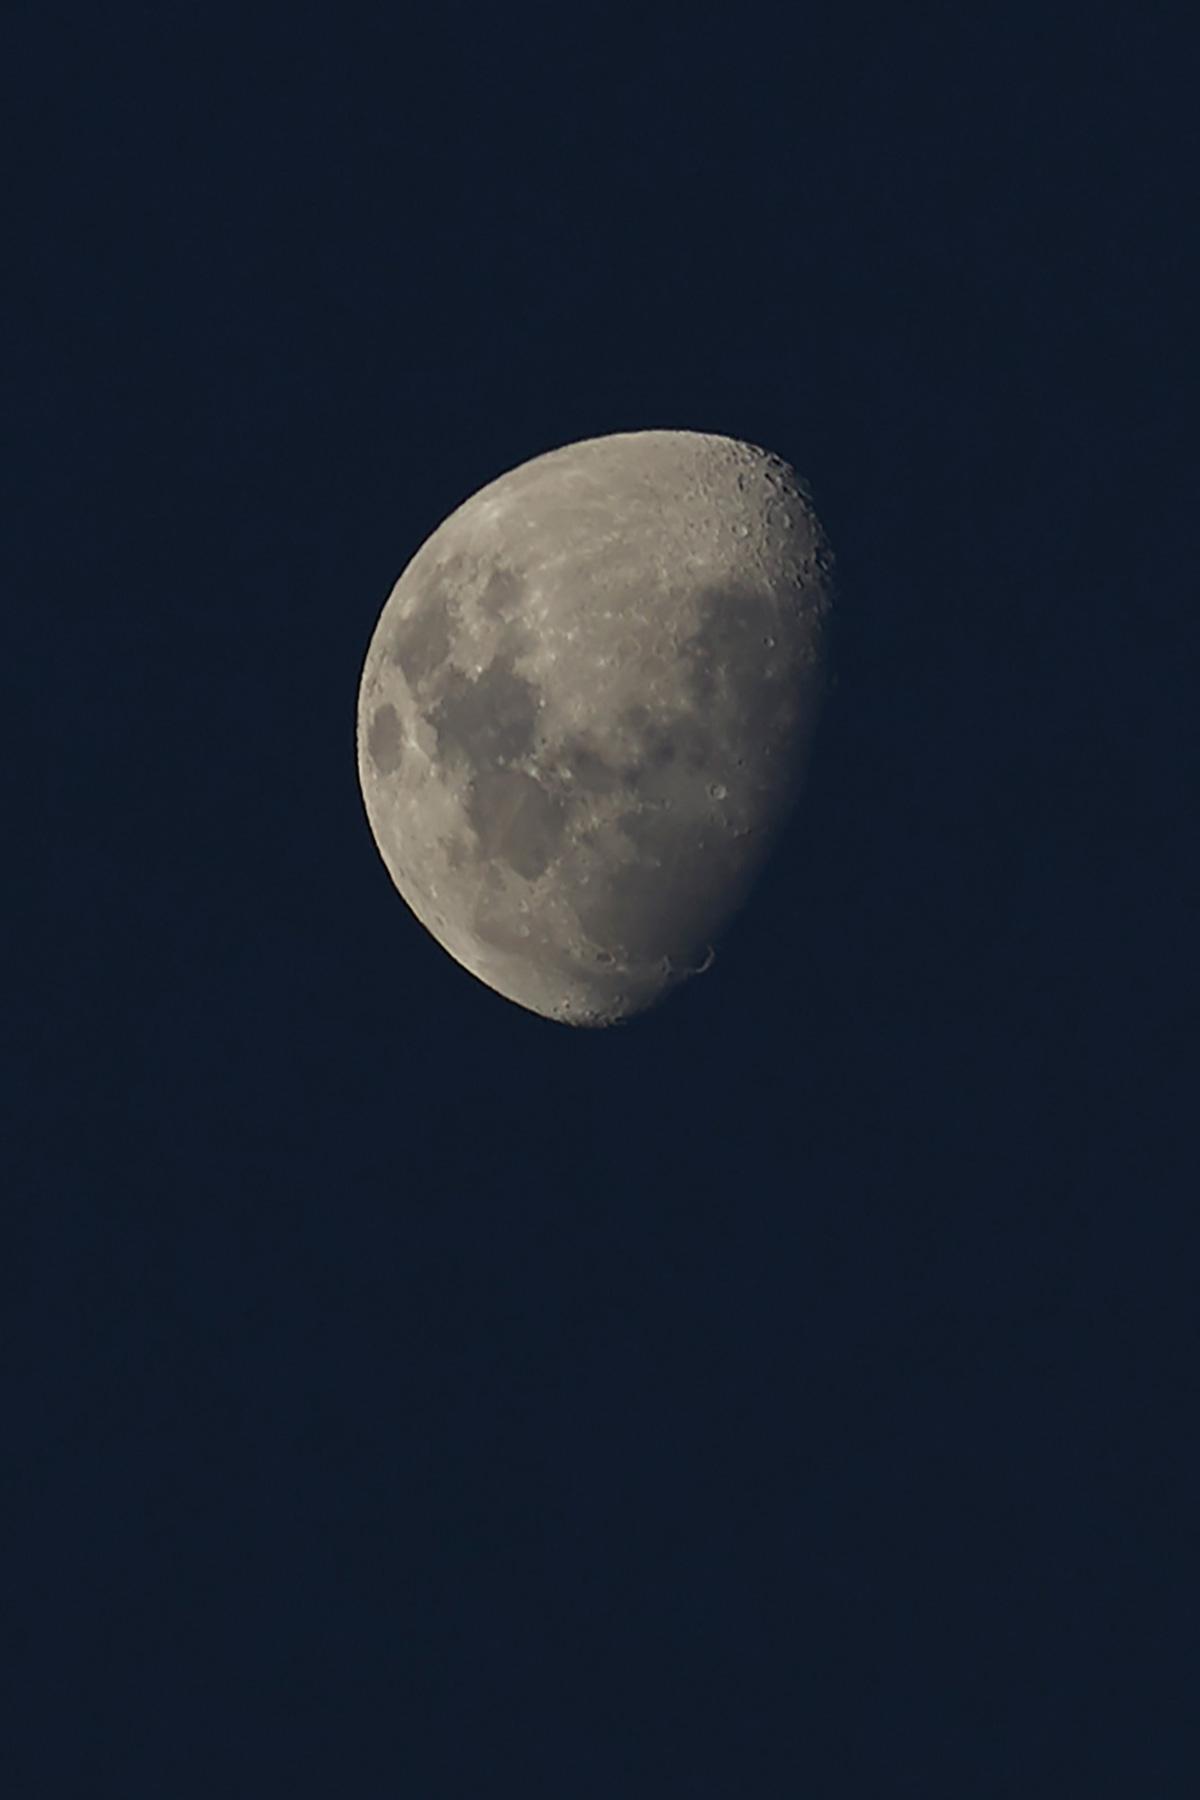 Sara-Mond-1084-MaraSommer.jpg